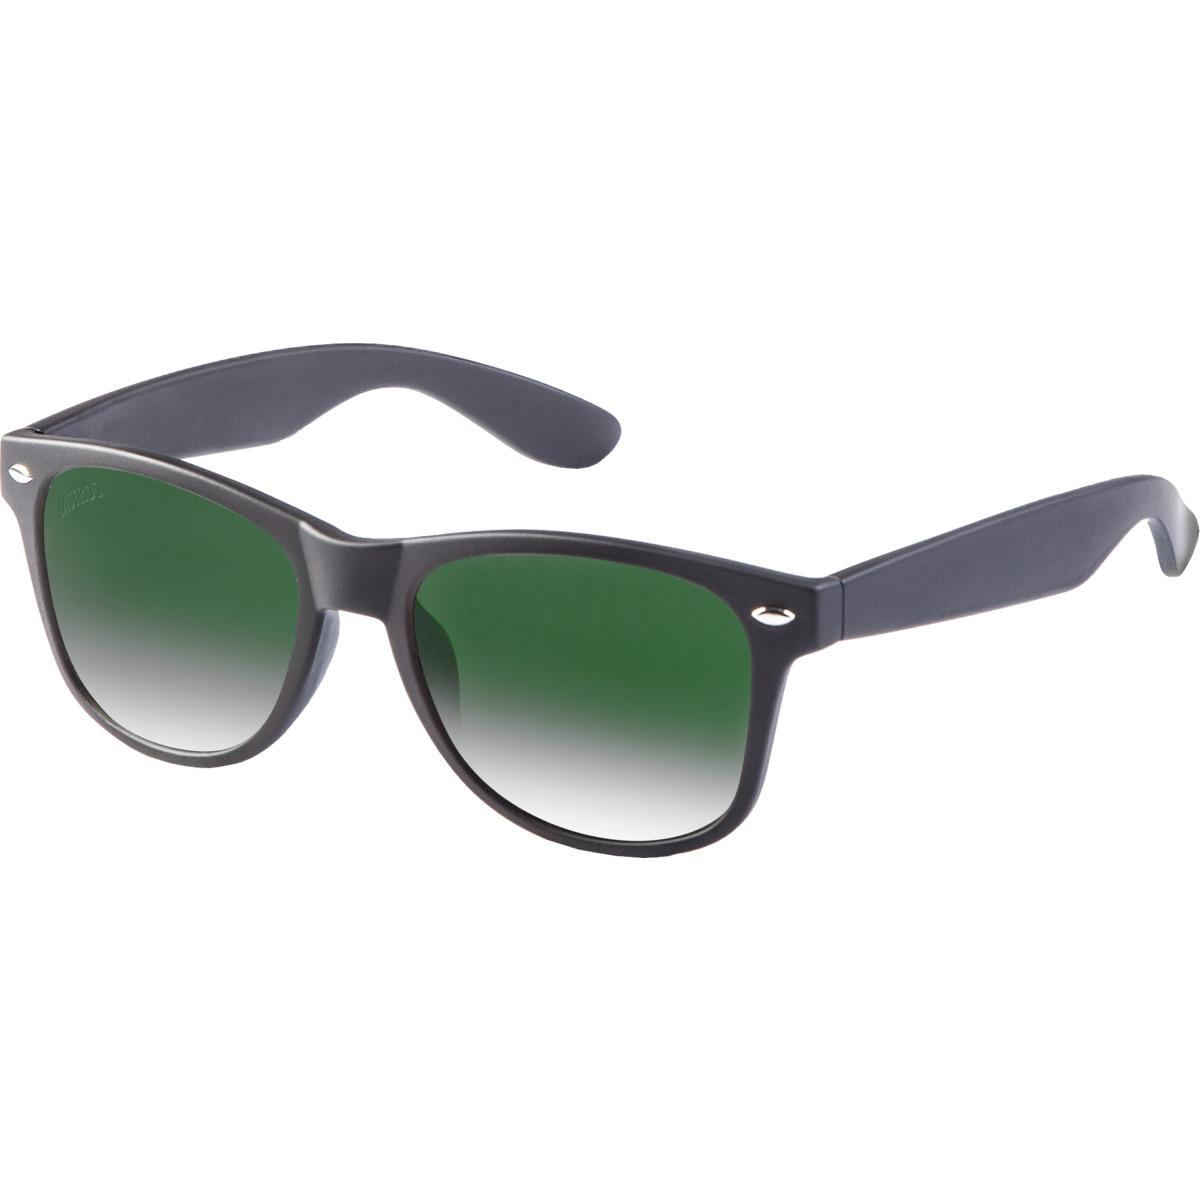 MasterDis Sonnenbrille Likoma Mirror black/green SPxaK3